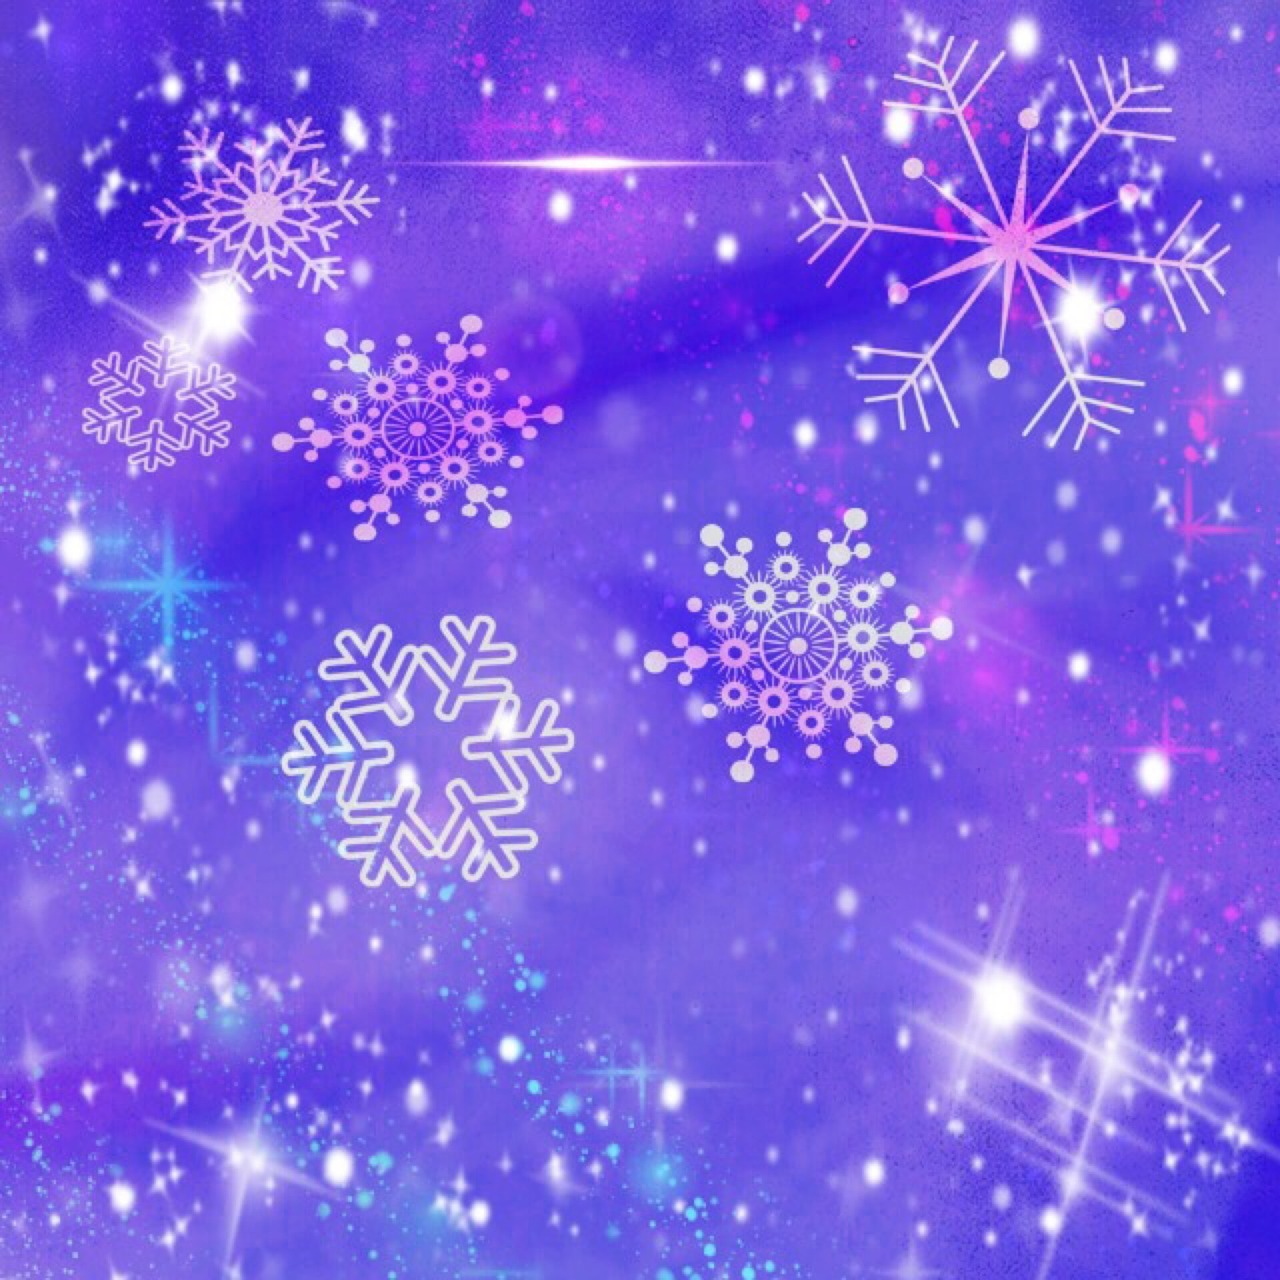 Звездочки картинки снежинки